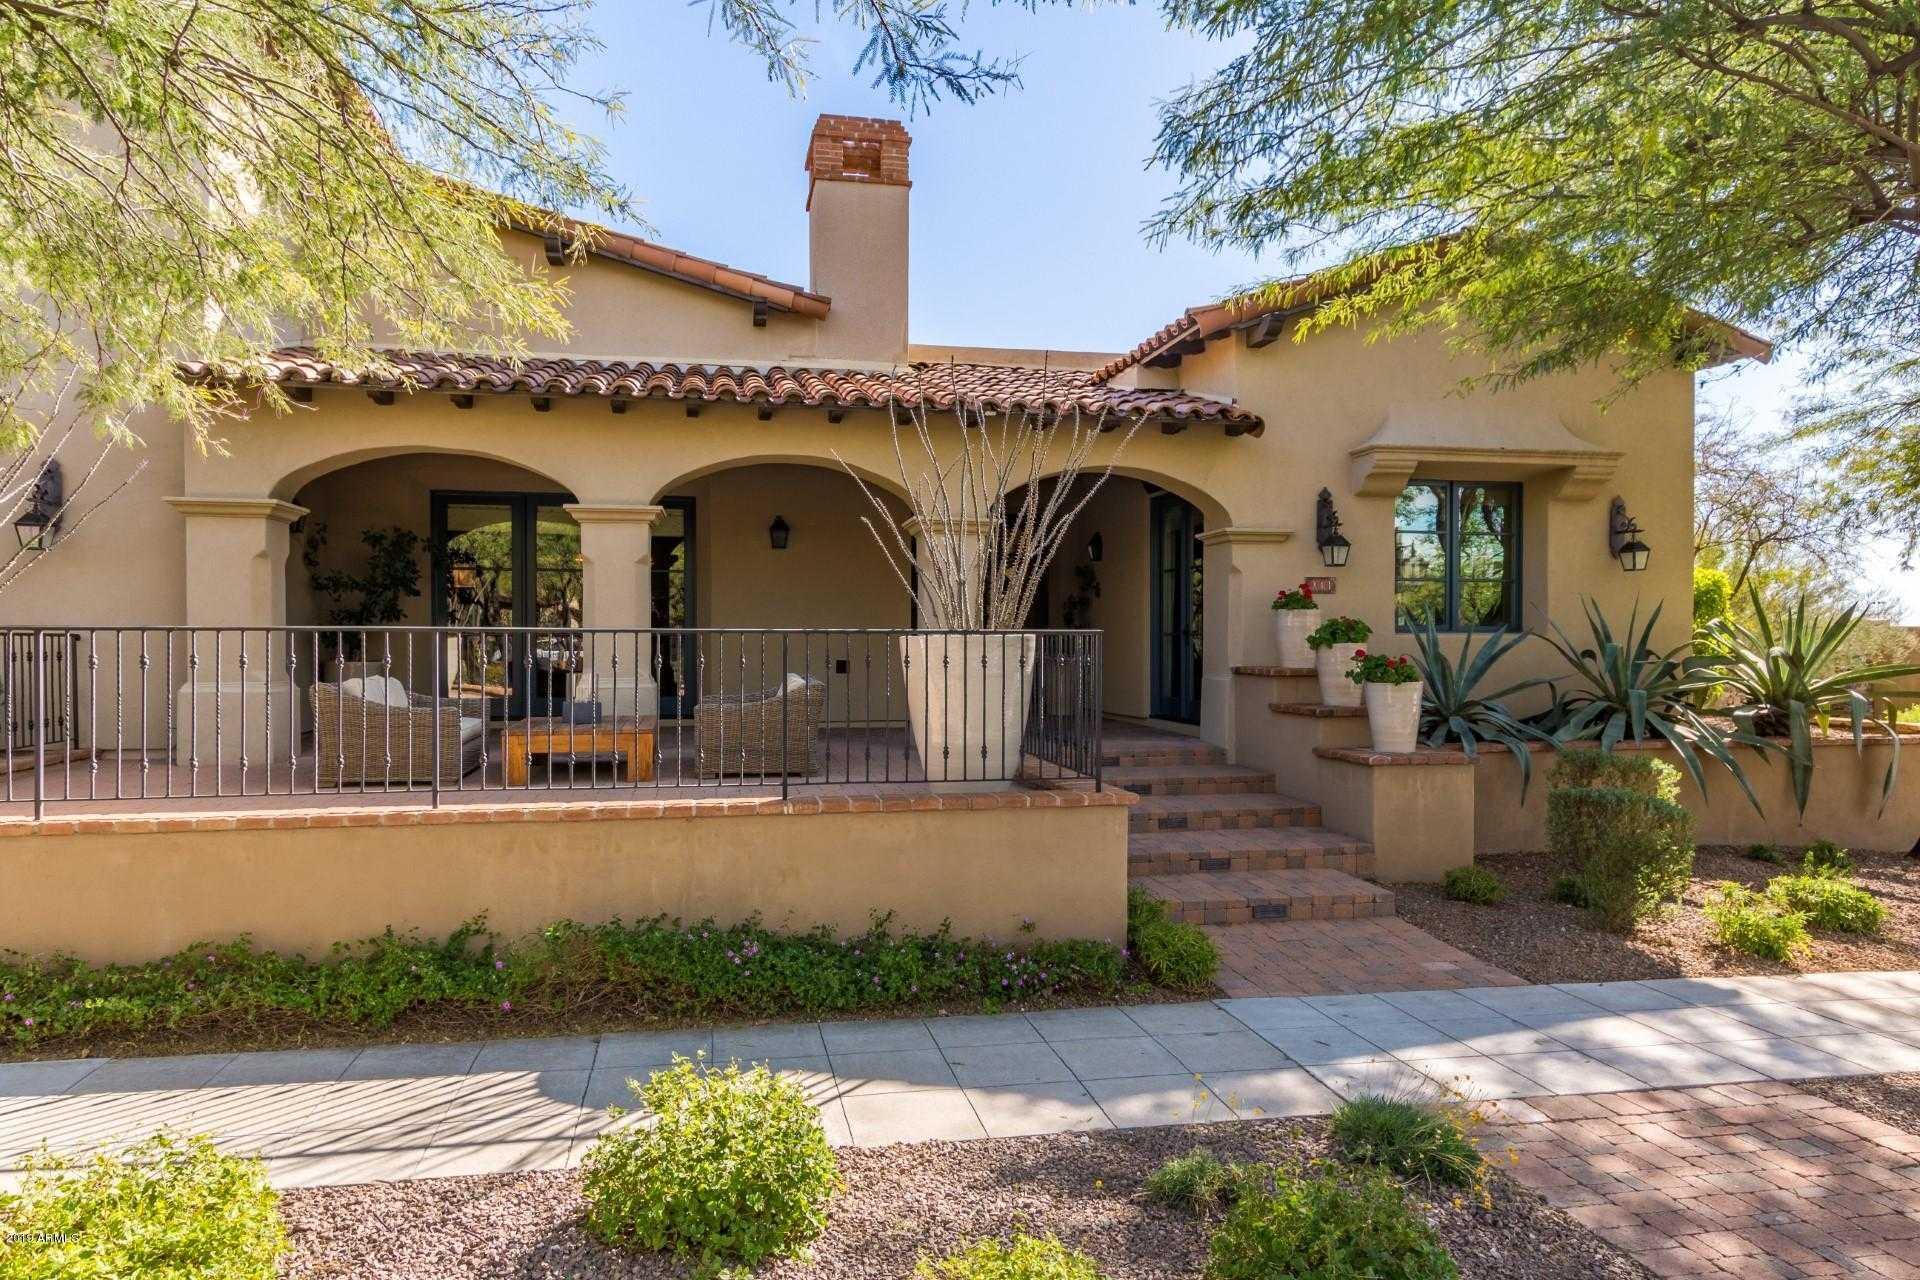 $1,180,000 - 3Br/5Ba - Home for Sale in Dc Ranch Parcel G.1, Scottsdale